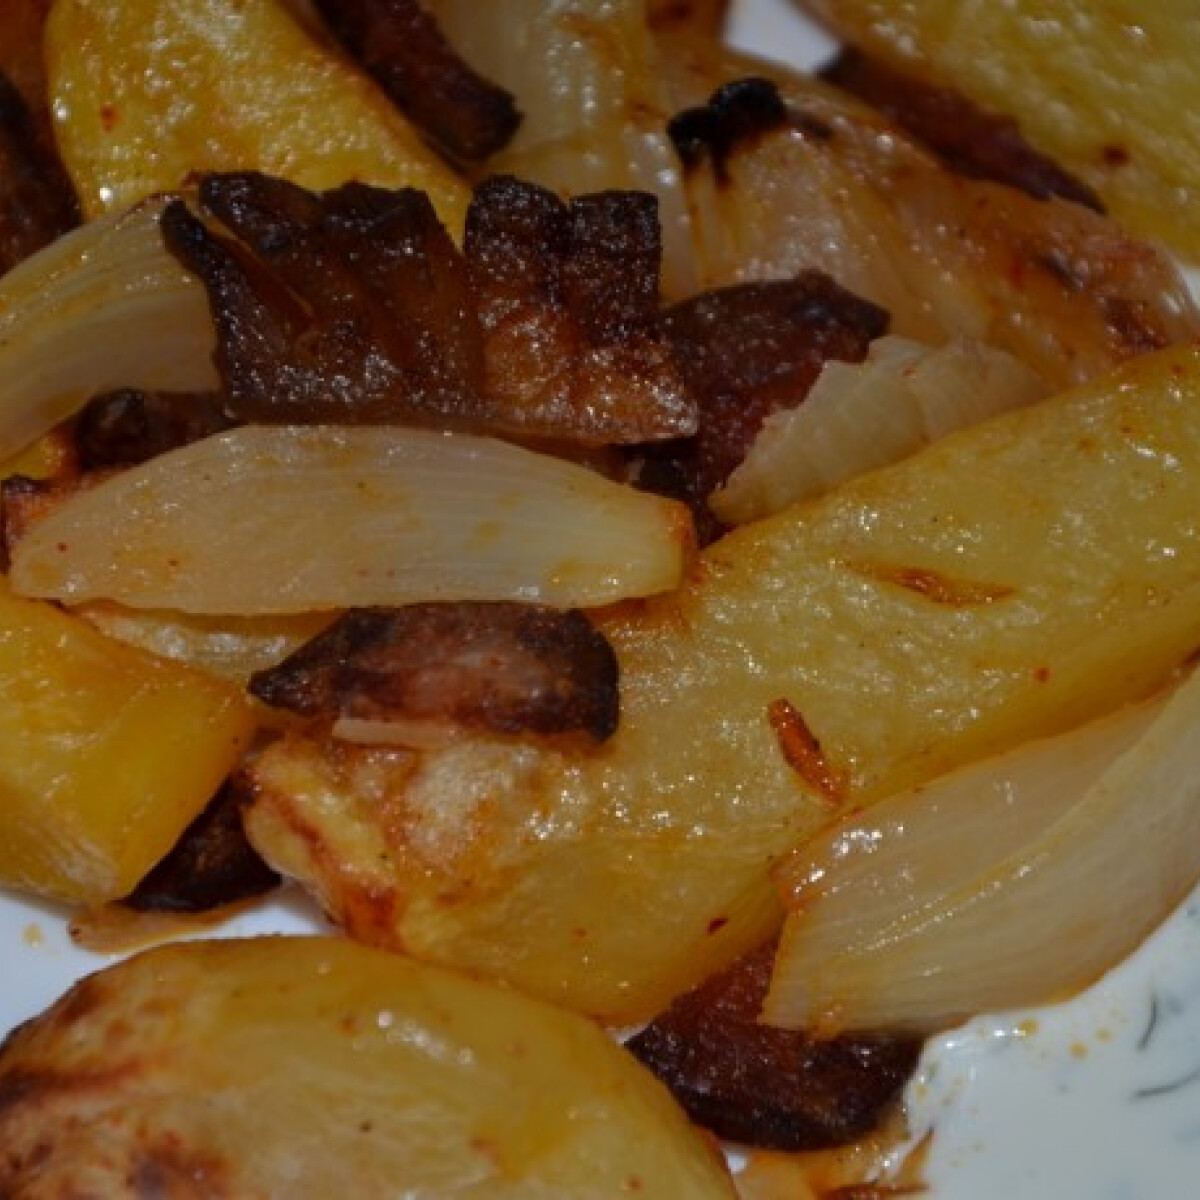 Tepsis krumpli kapros-tejfölös mártással